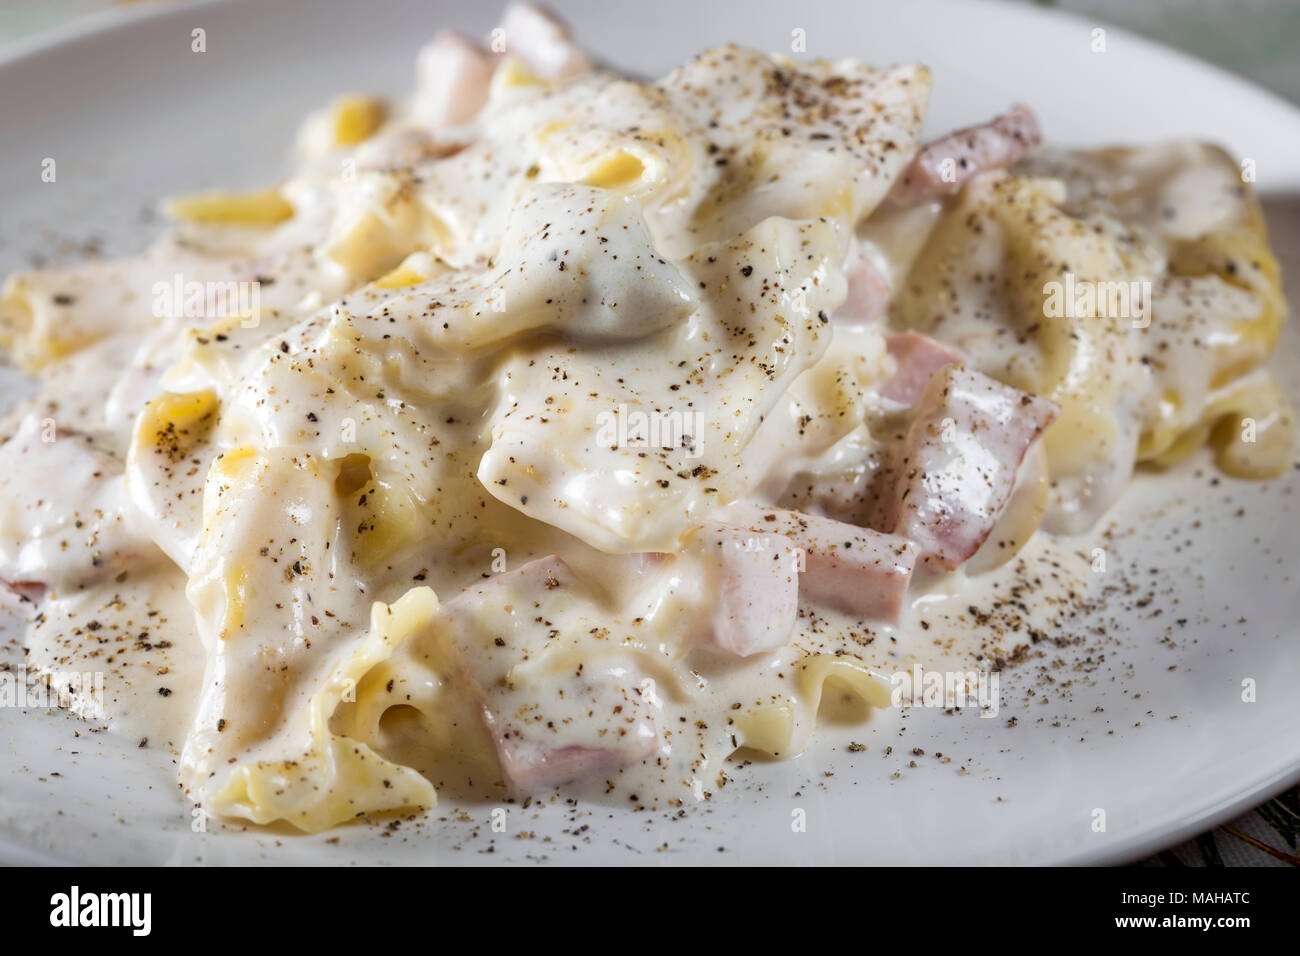 Tortellini And Ravioli With Smoked Ham And Mushrooms And Sour Cream Sauce Stock Photo Alamy